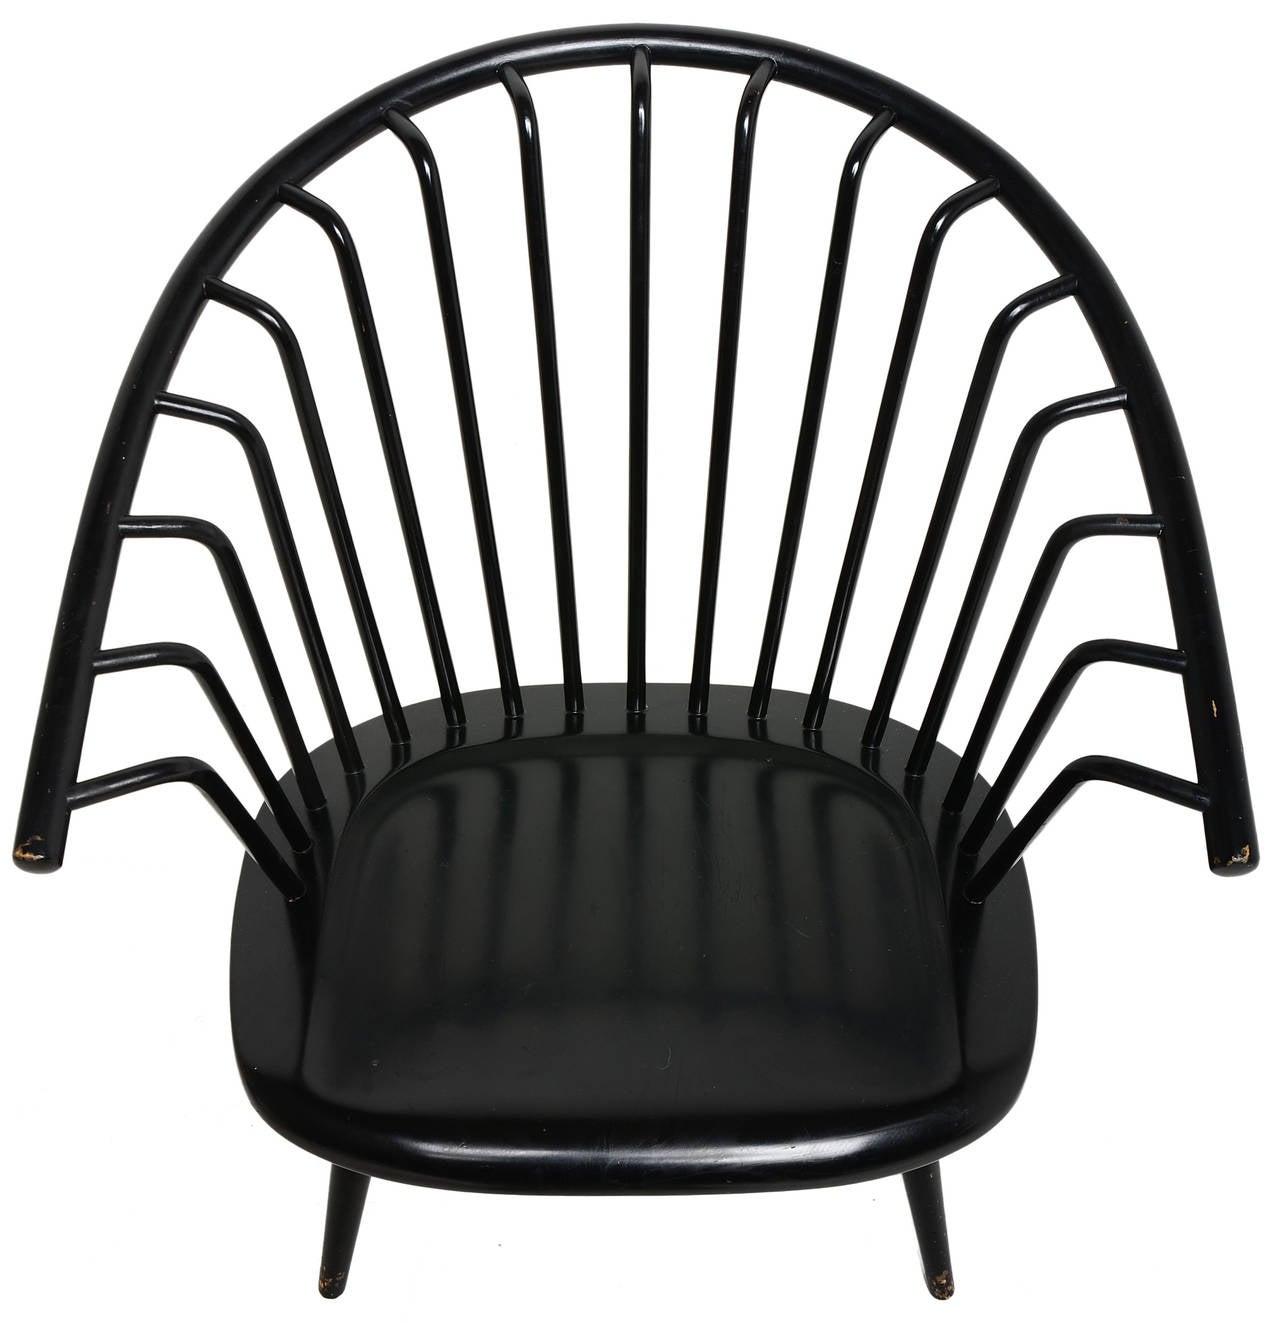 Ilmari Tapiovaara Crinolette Lounge Chair In Good Condition For Sale In Brooklyn/Toronto, Ontario